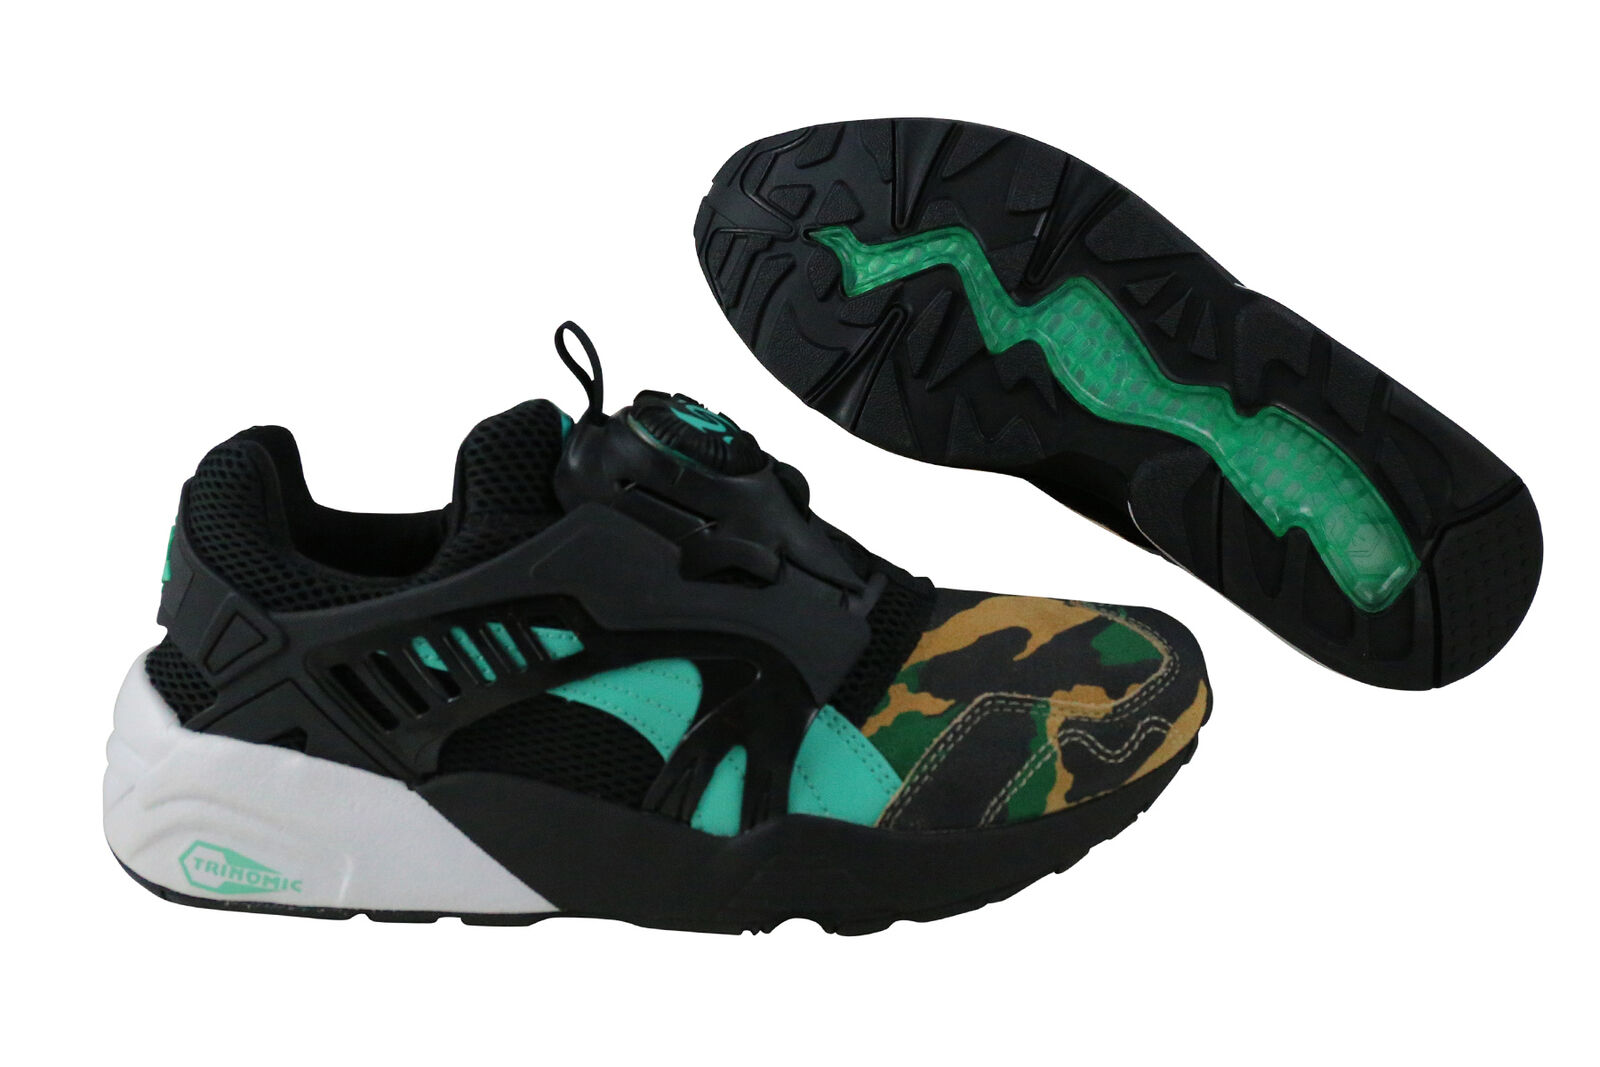 Puma Disc Blaze Night Jungle black electric green Schuhe 363060 01 schwarz